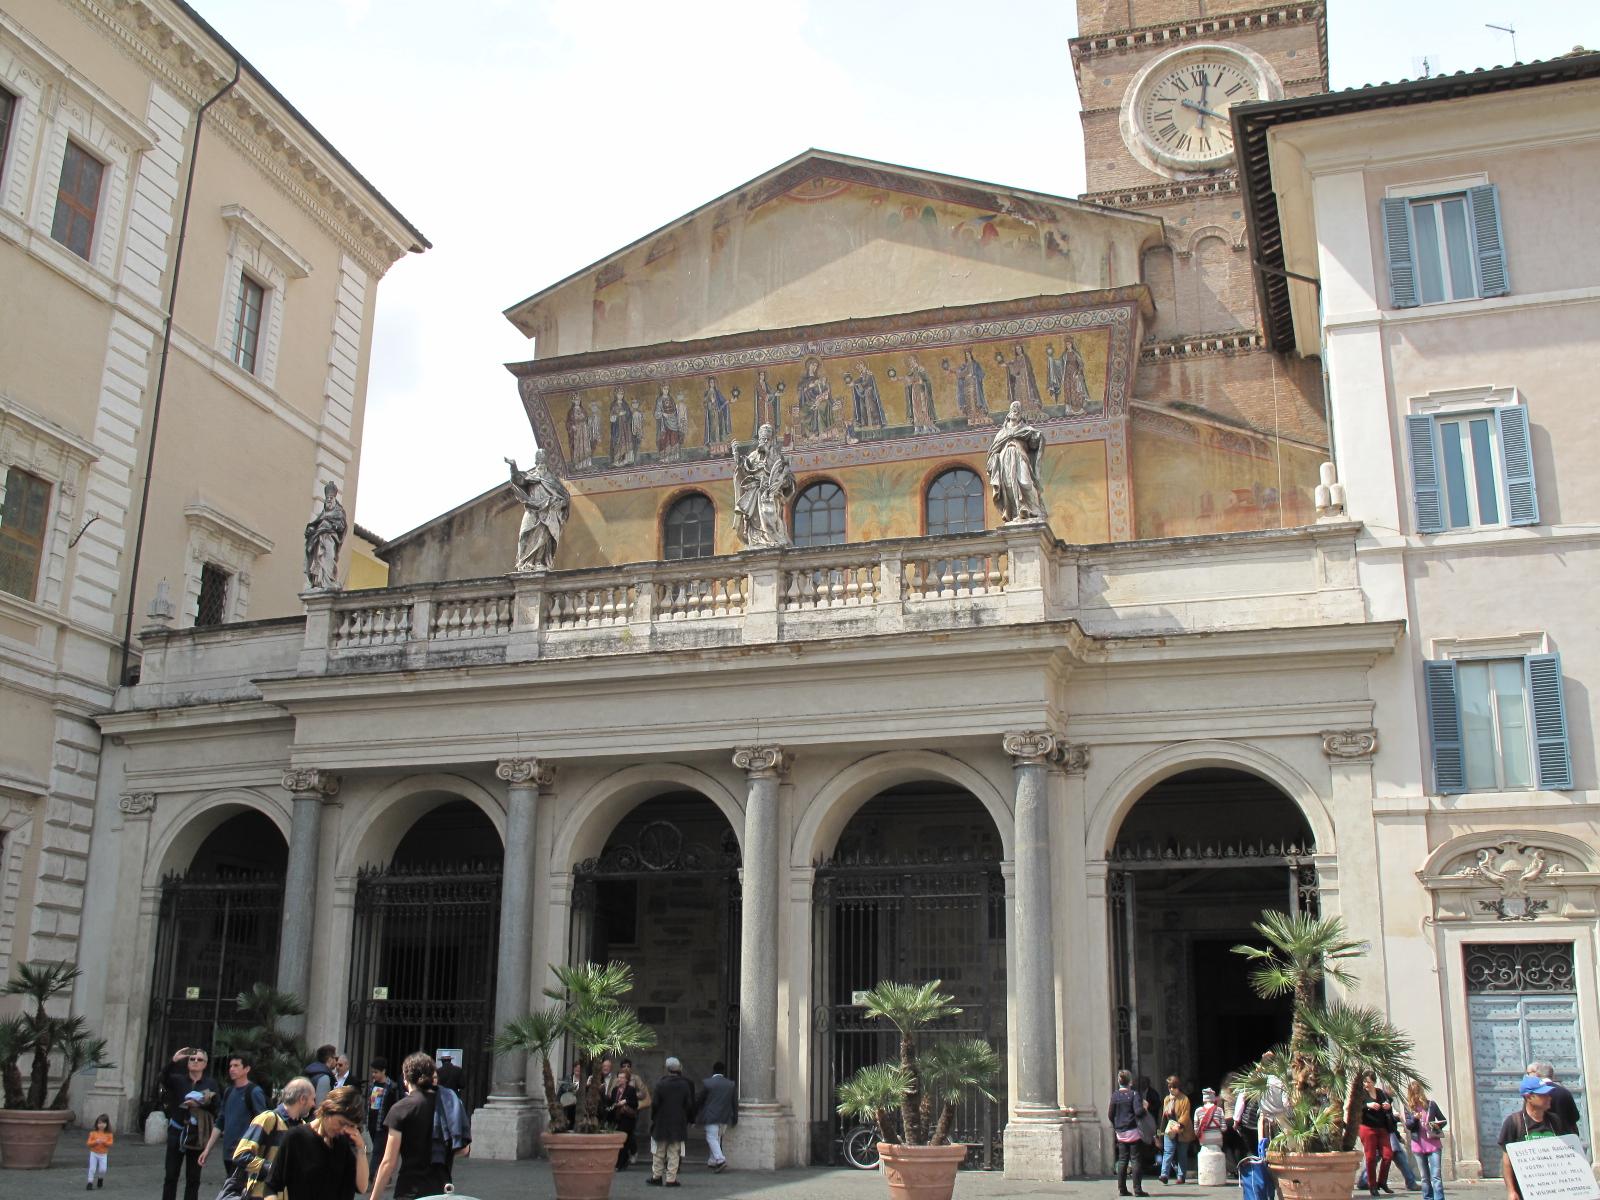 Church of Santa Maria Trastevere